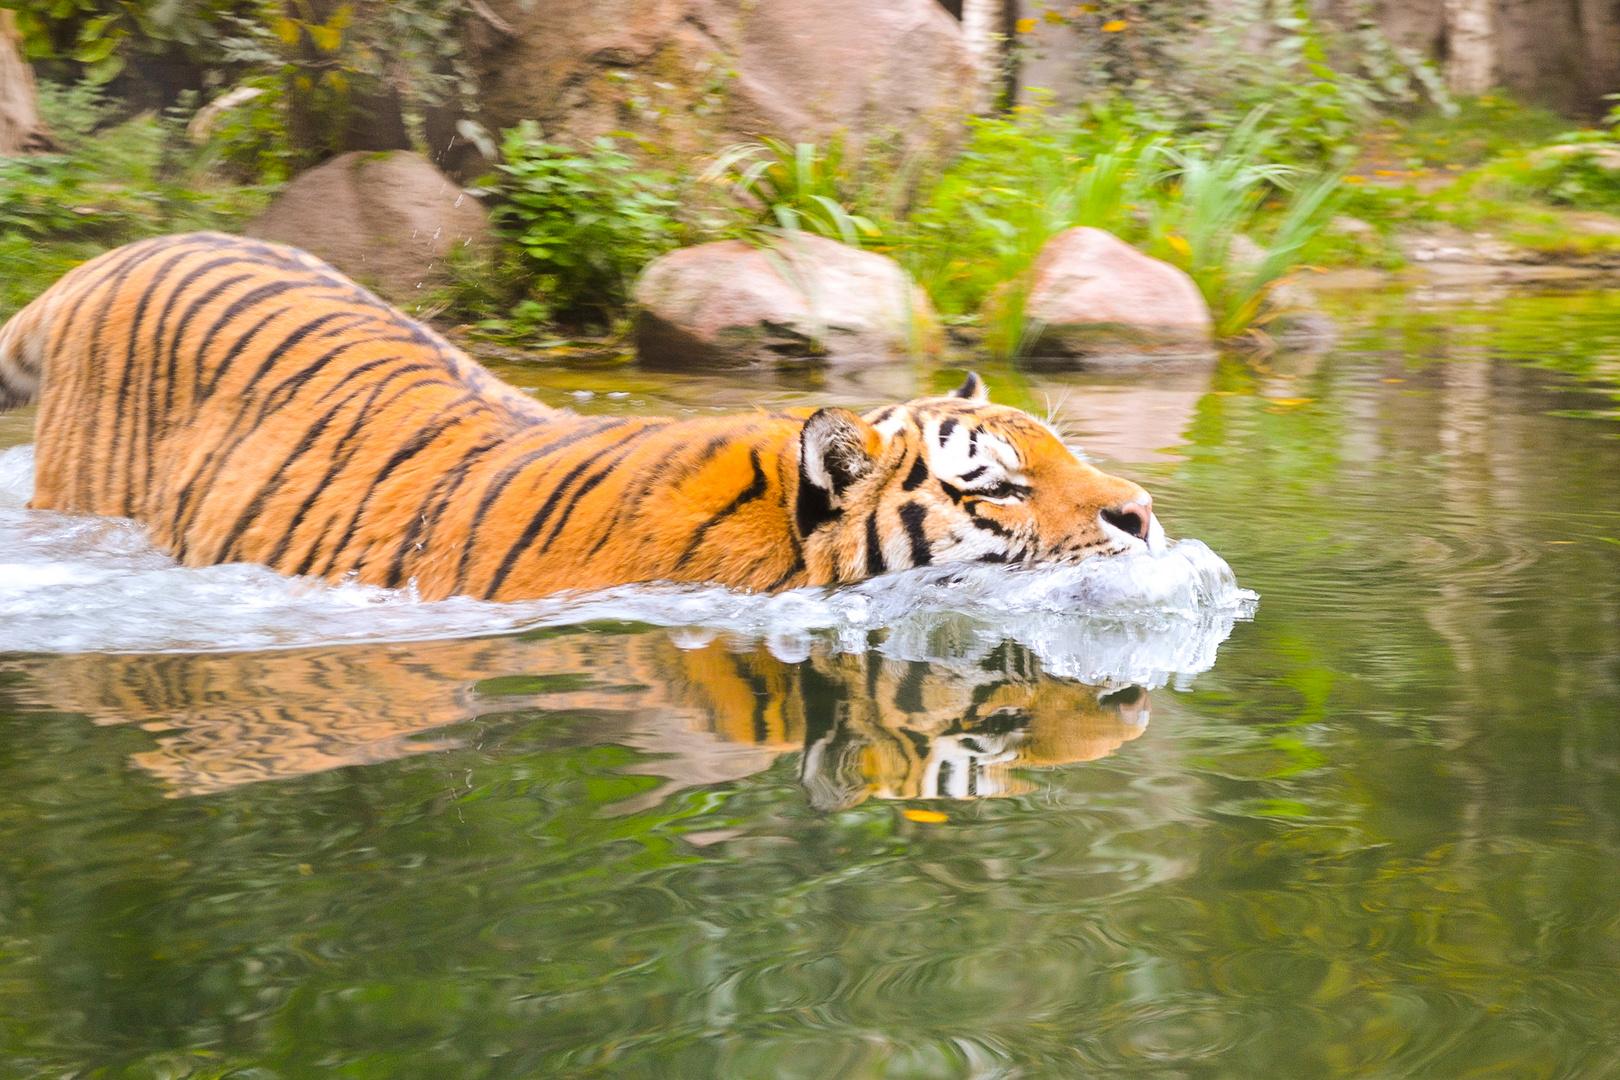 Tiger im Tauchgang